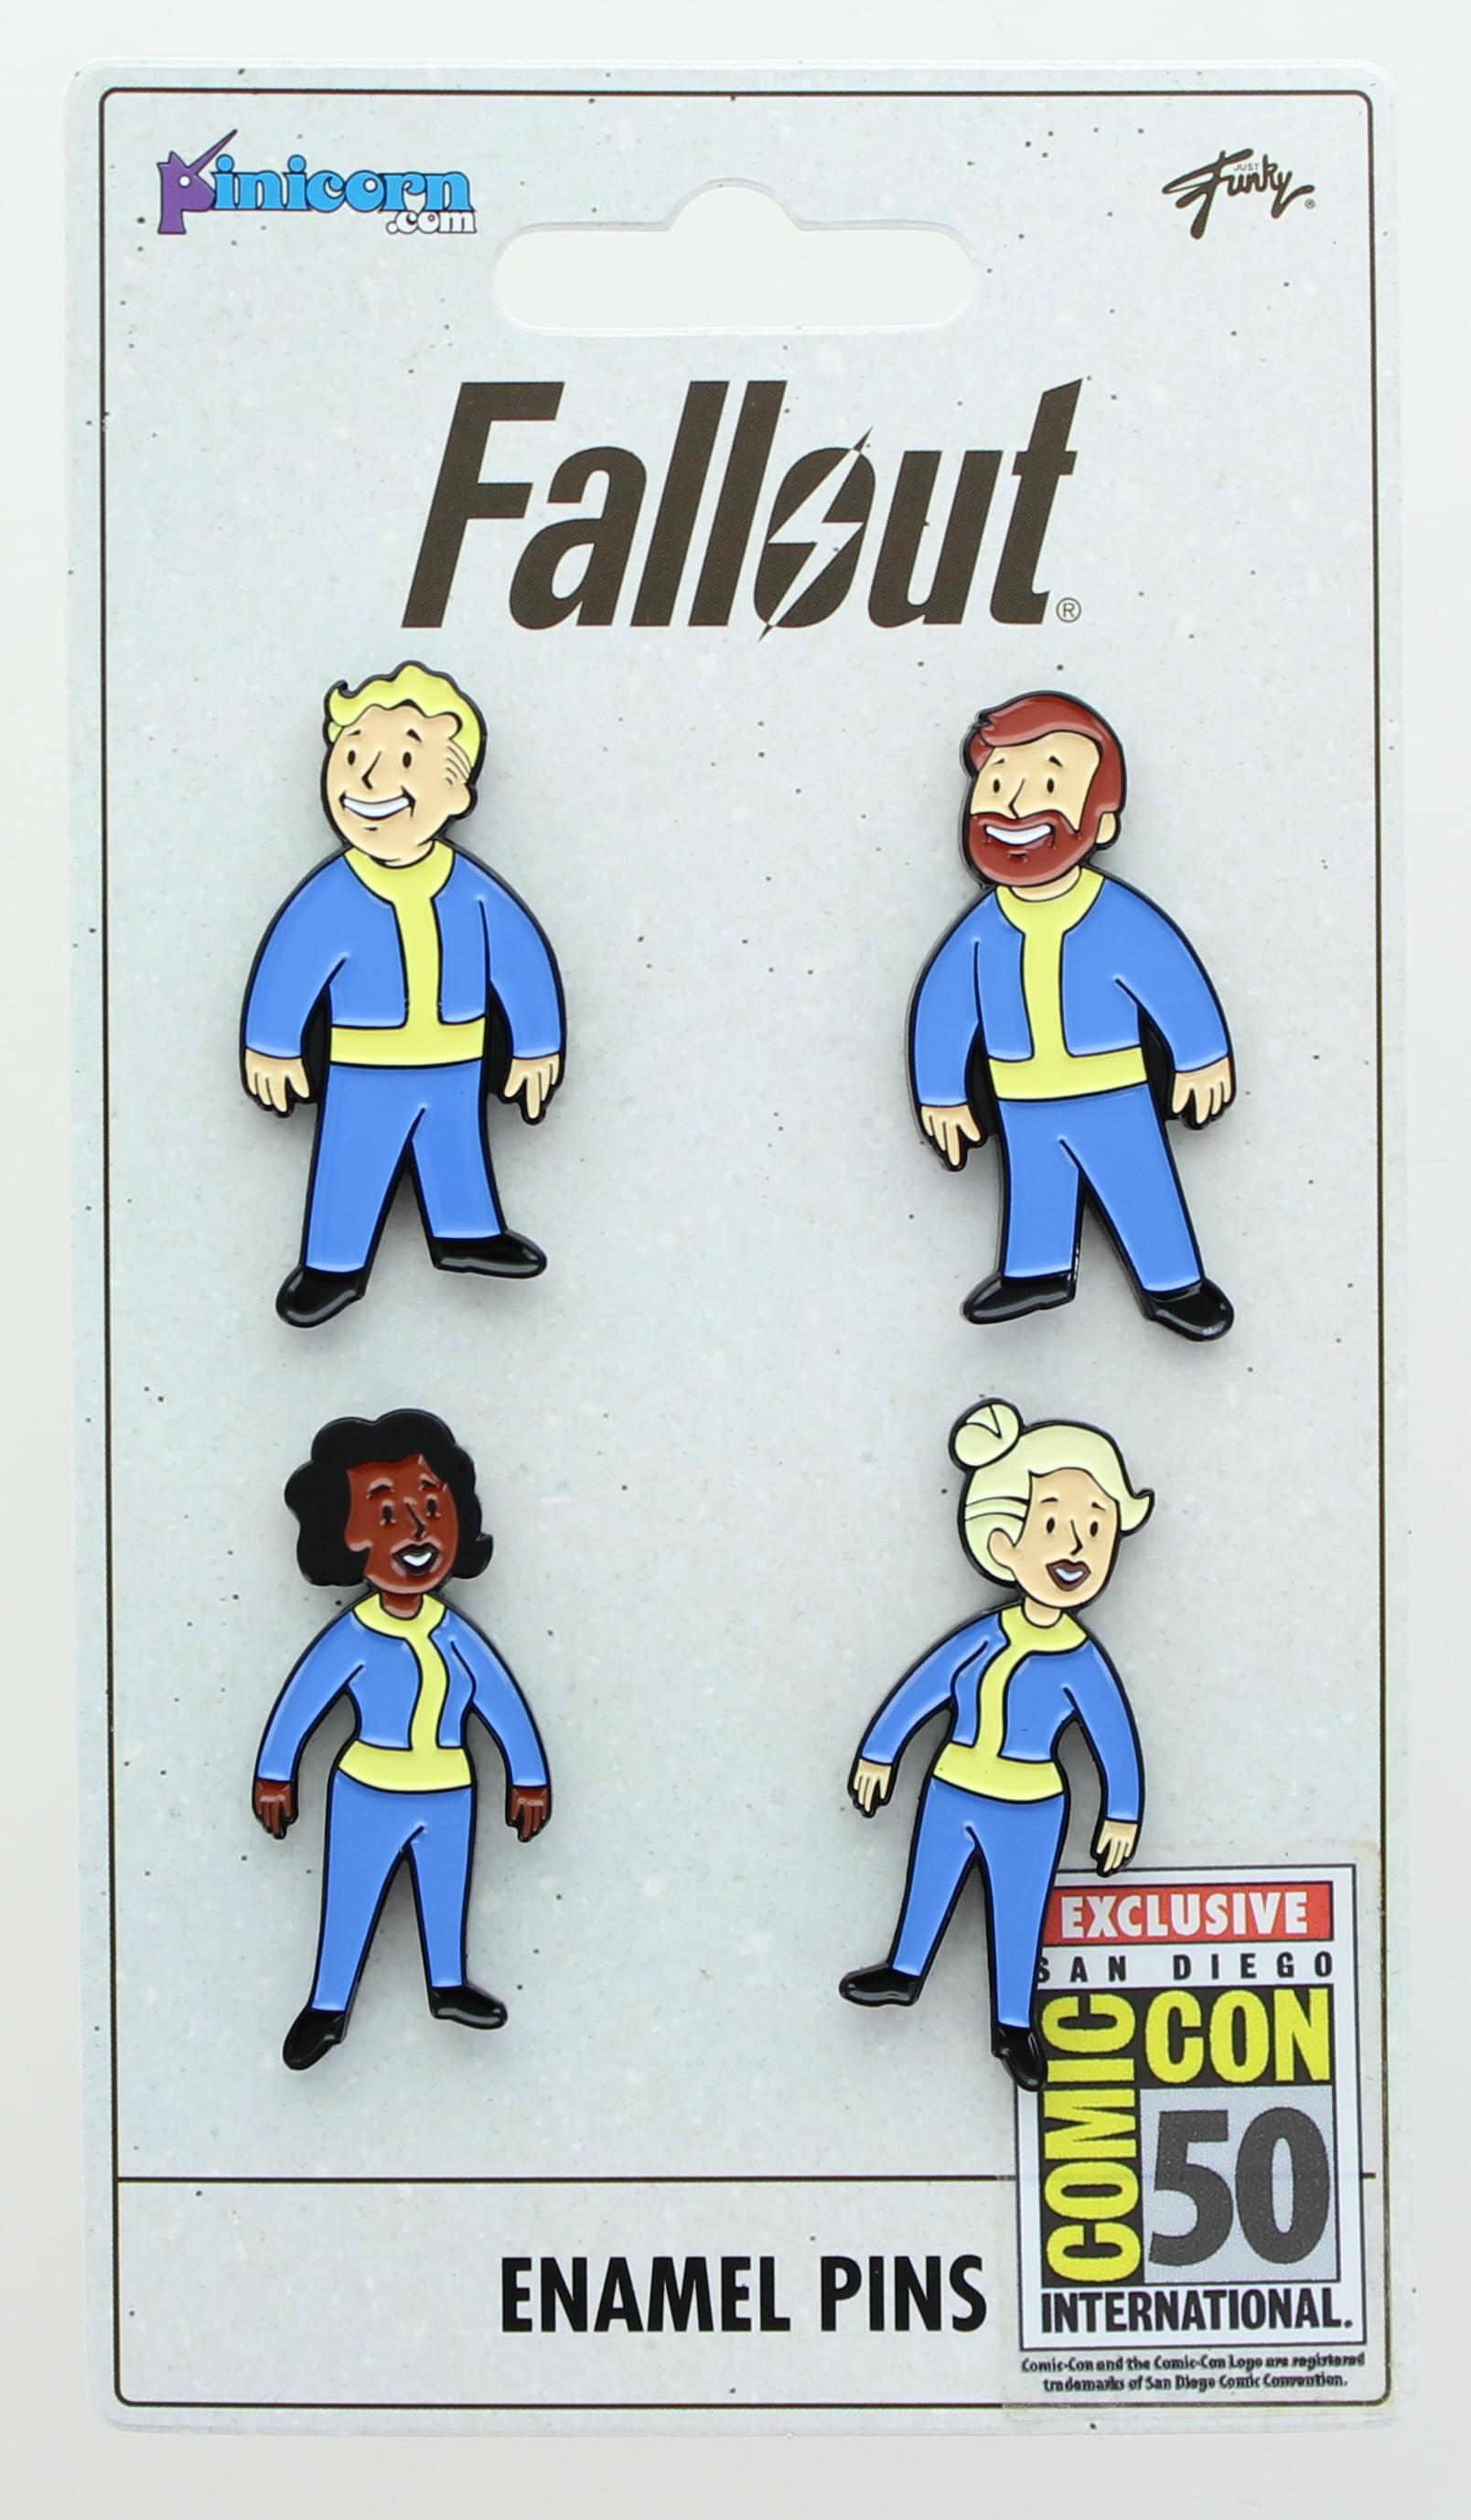 Fallout Vault Dweller Pins | Collectible Metal Enamel Pin Set | Includes 4 Pins